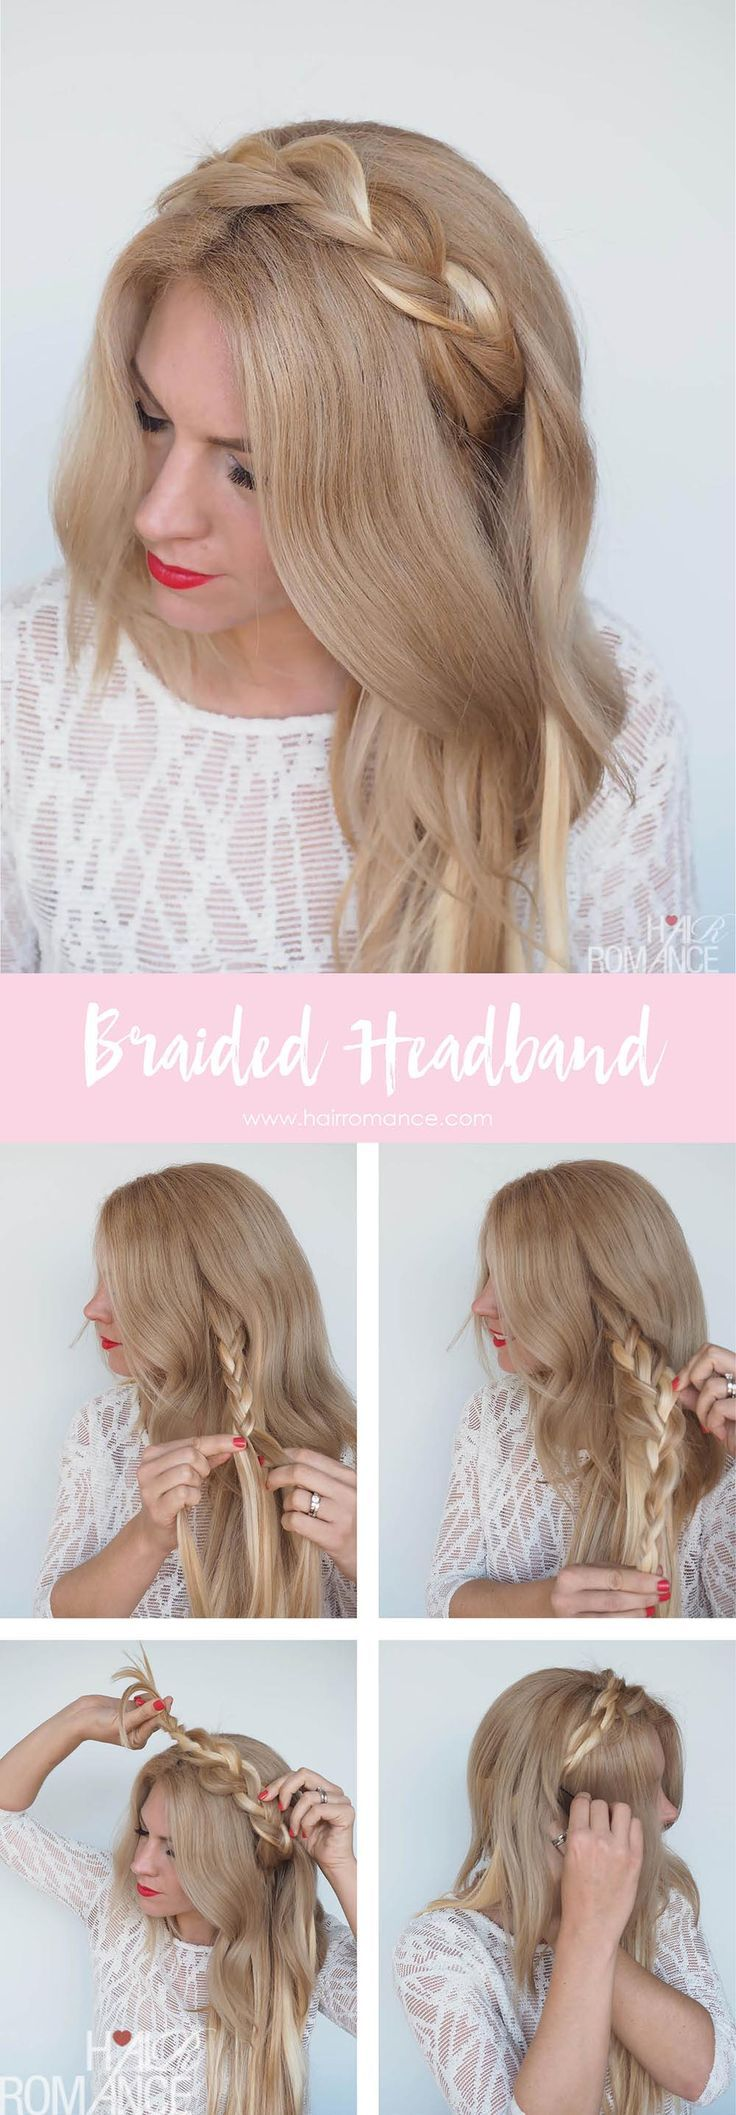 Braided headband hairstyle tutorial